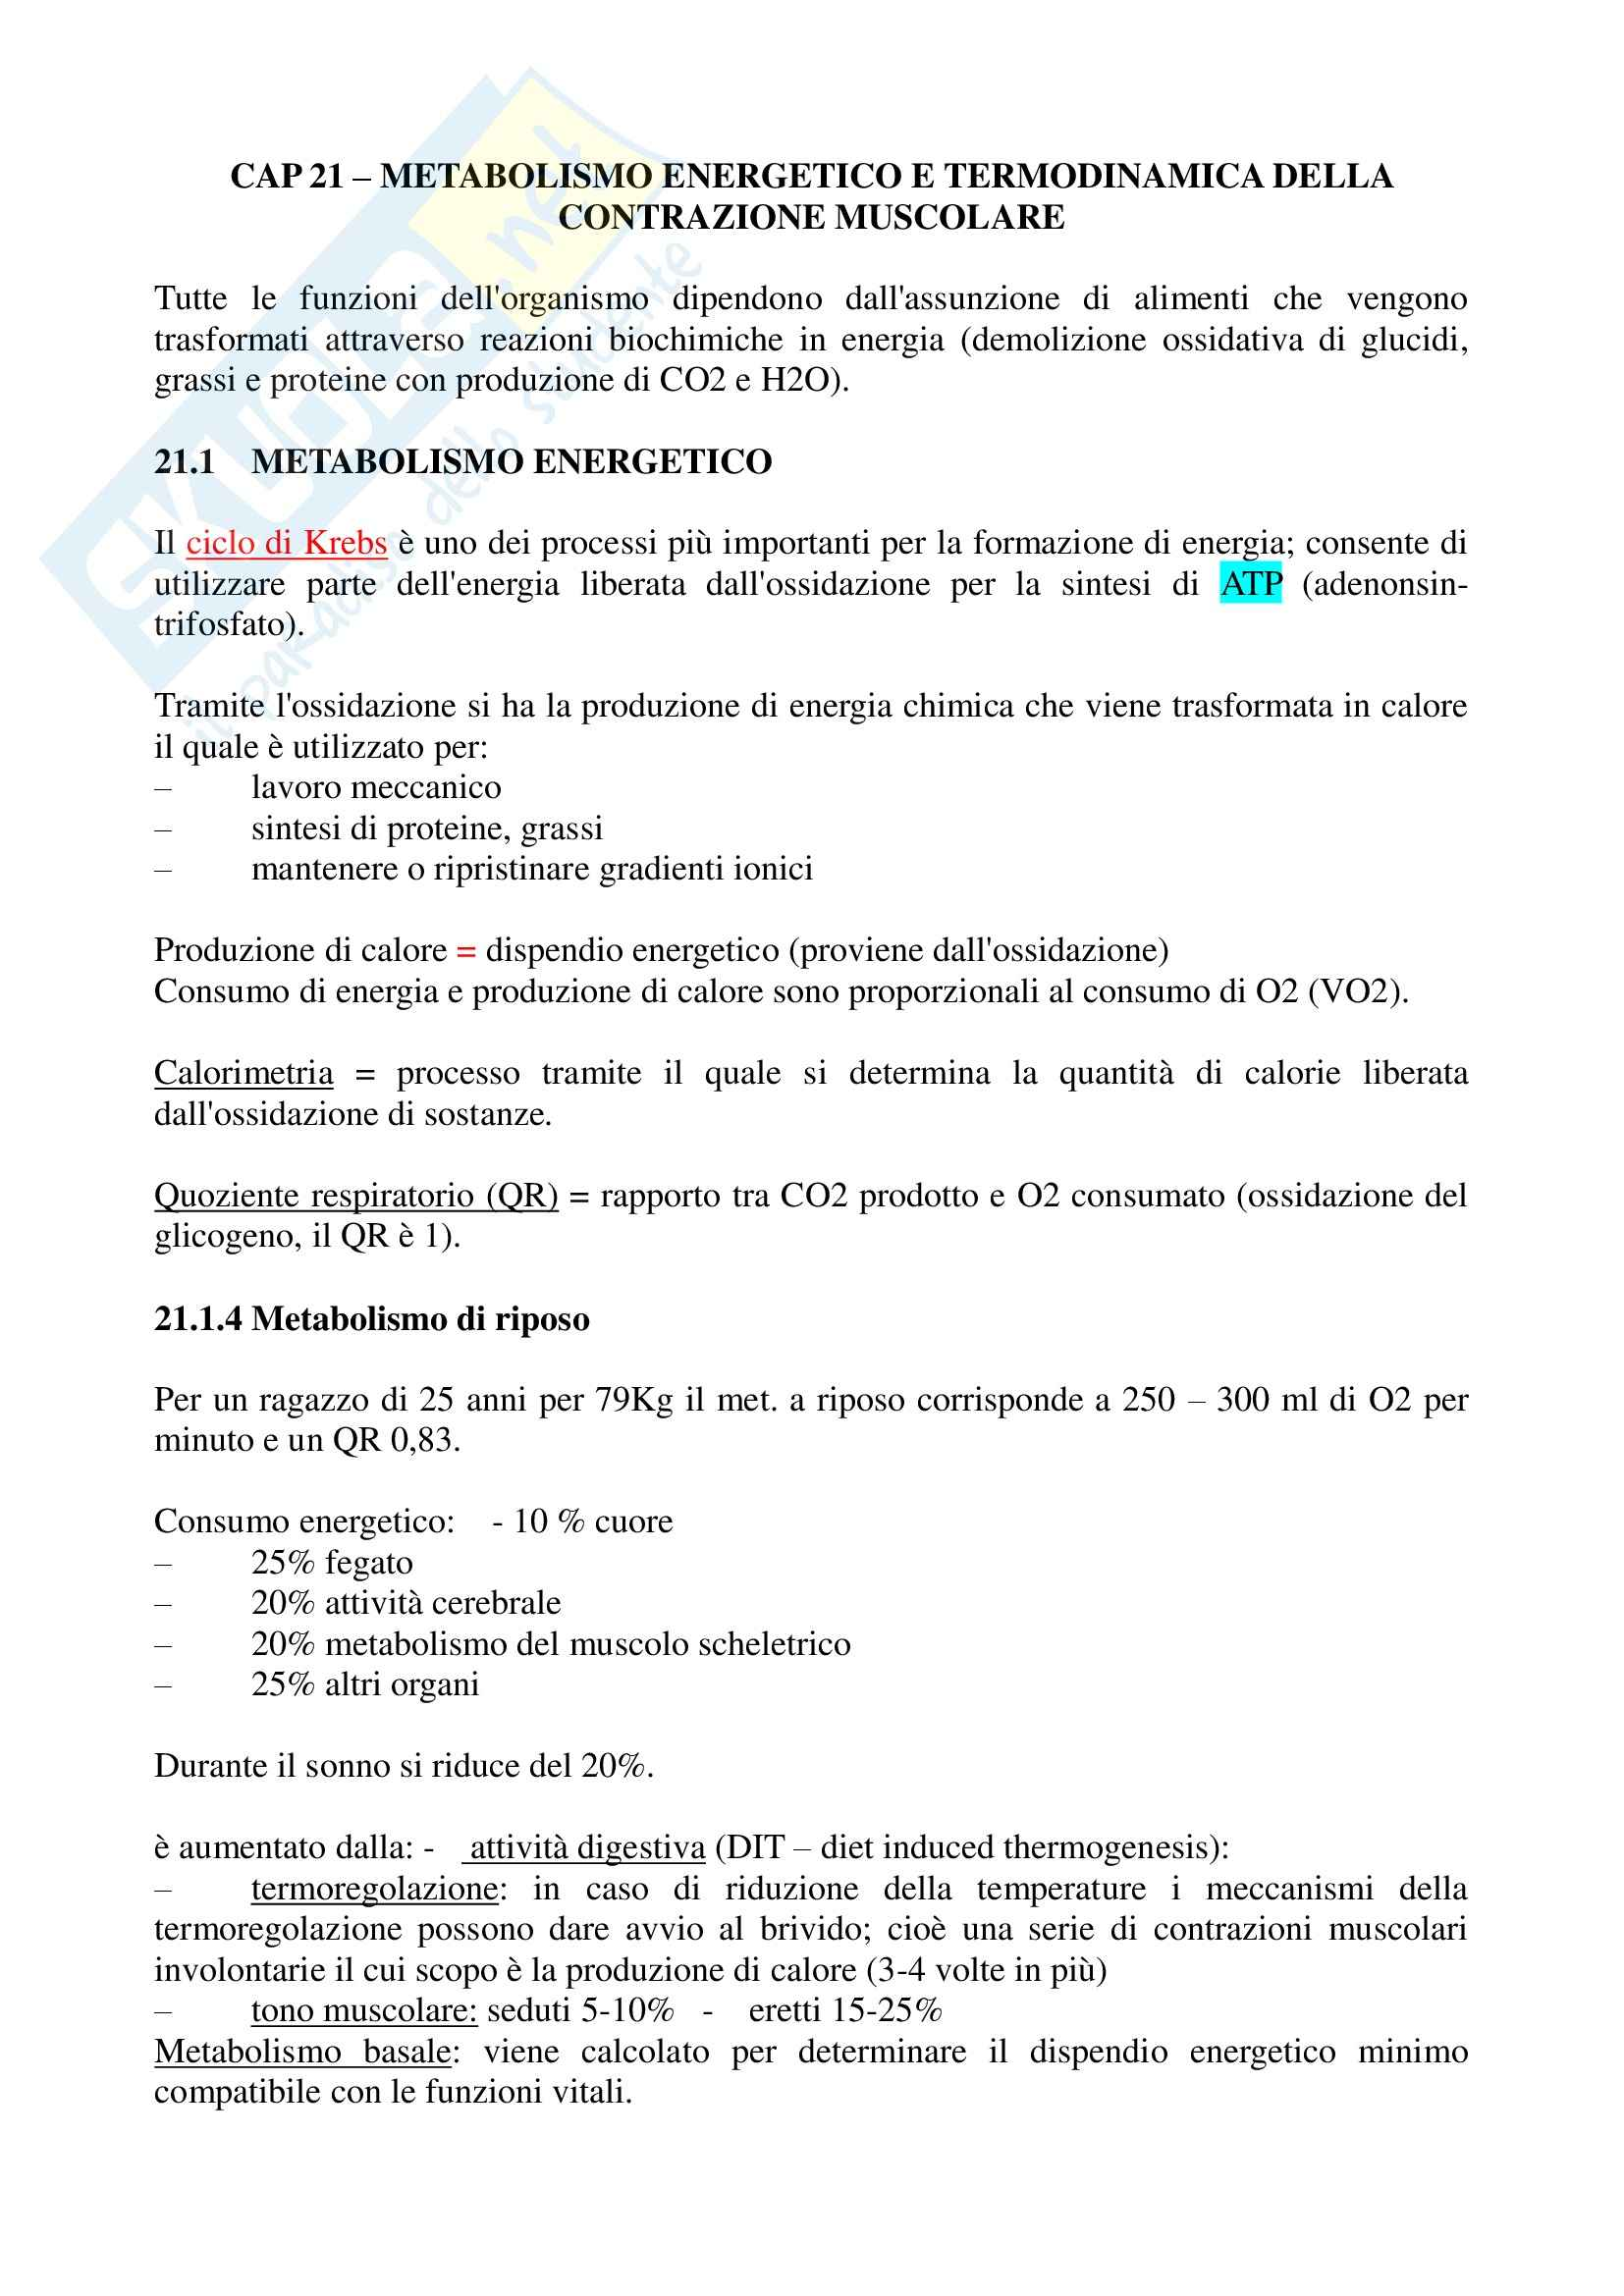 Riassunto esame Fisiologia Generale, prof. Veicsteinas, libro consigliato Fisiologia dell'Uomo - cap. 21